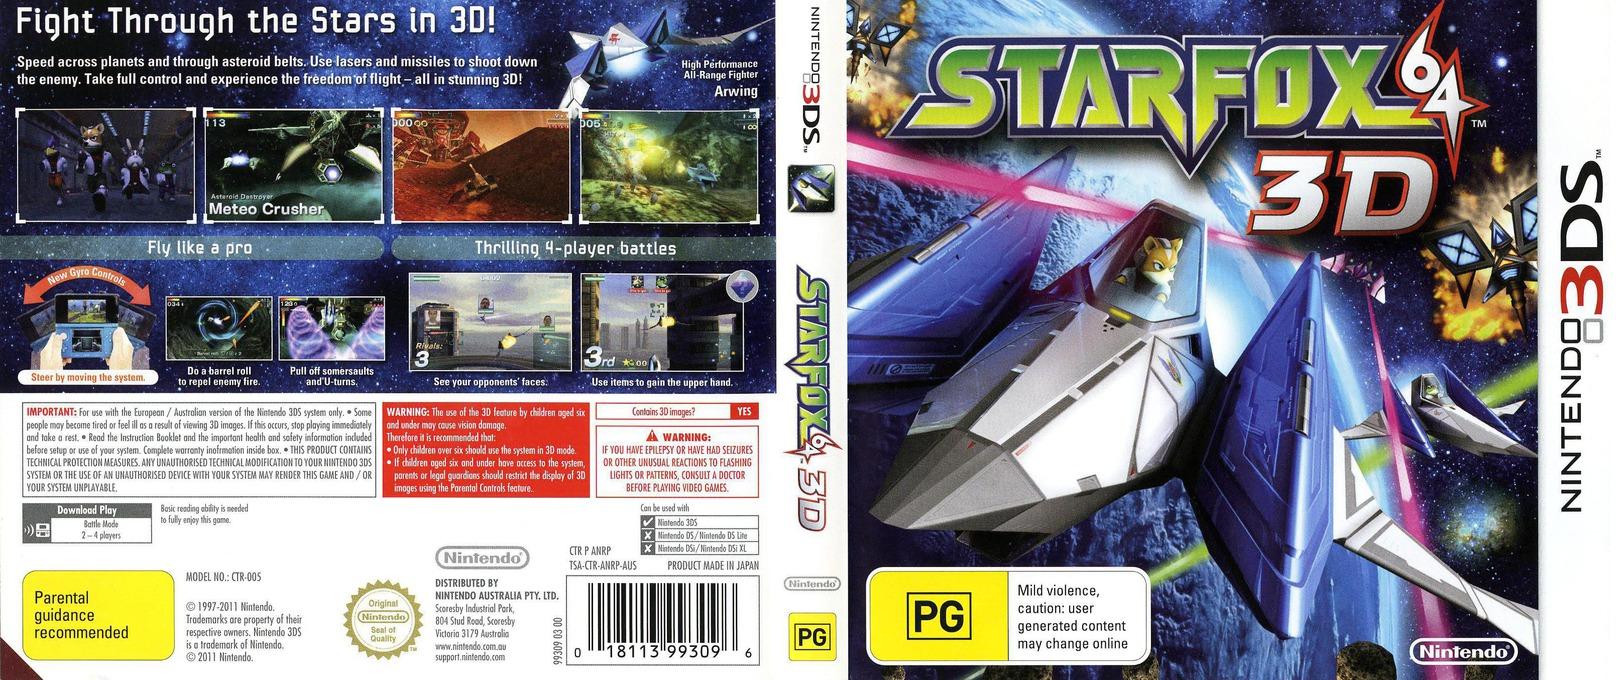 Star Fox 64 3D 3DS coverfullHQ (ANRP)